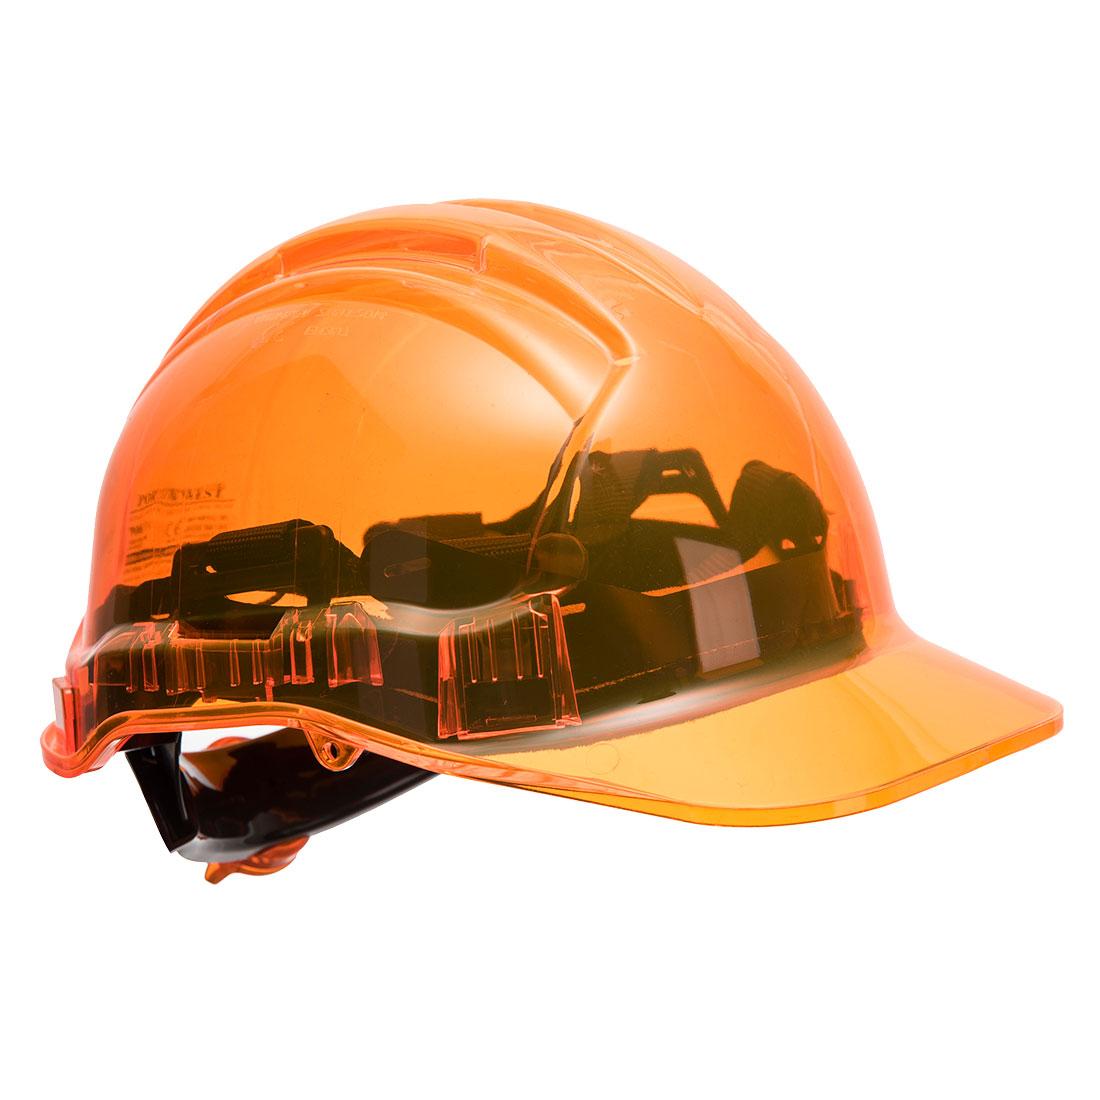 Peak View Ratchet Hard Hat Orange